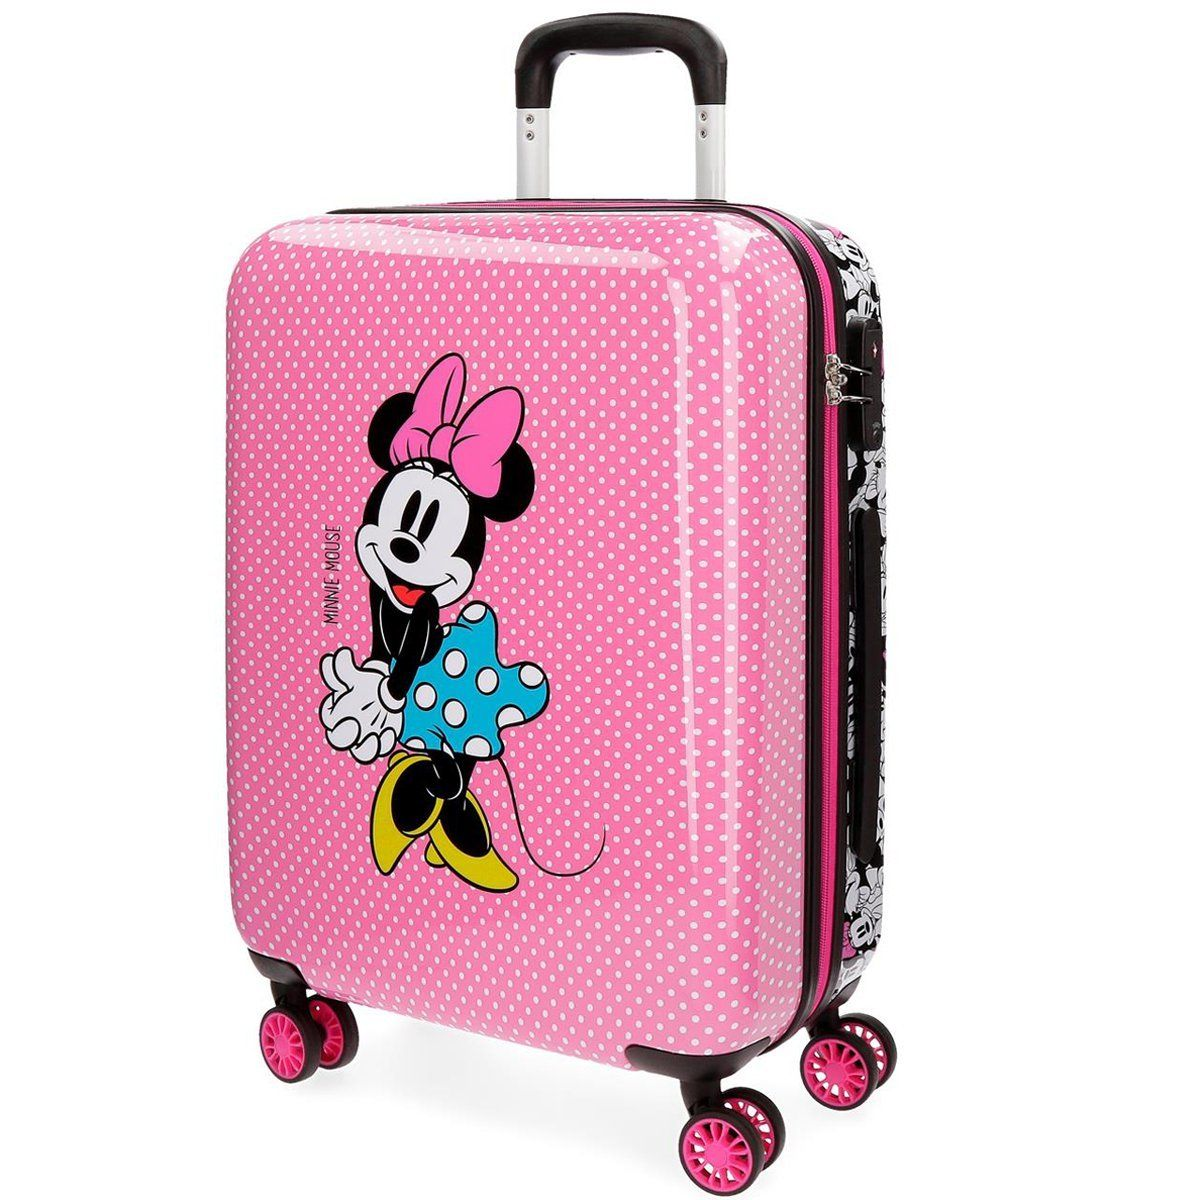 7fd498e83ab9b Artexpro Children's Luggage Pink Rose 55 x 40 x 20 cm   Quick Saves ...